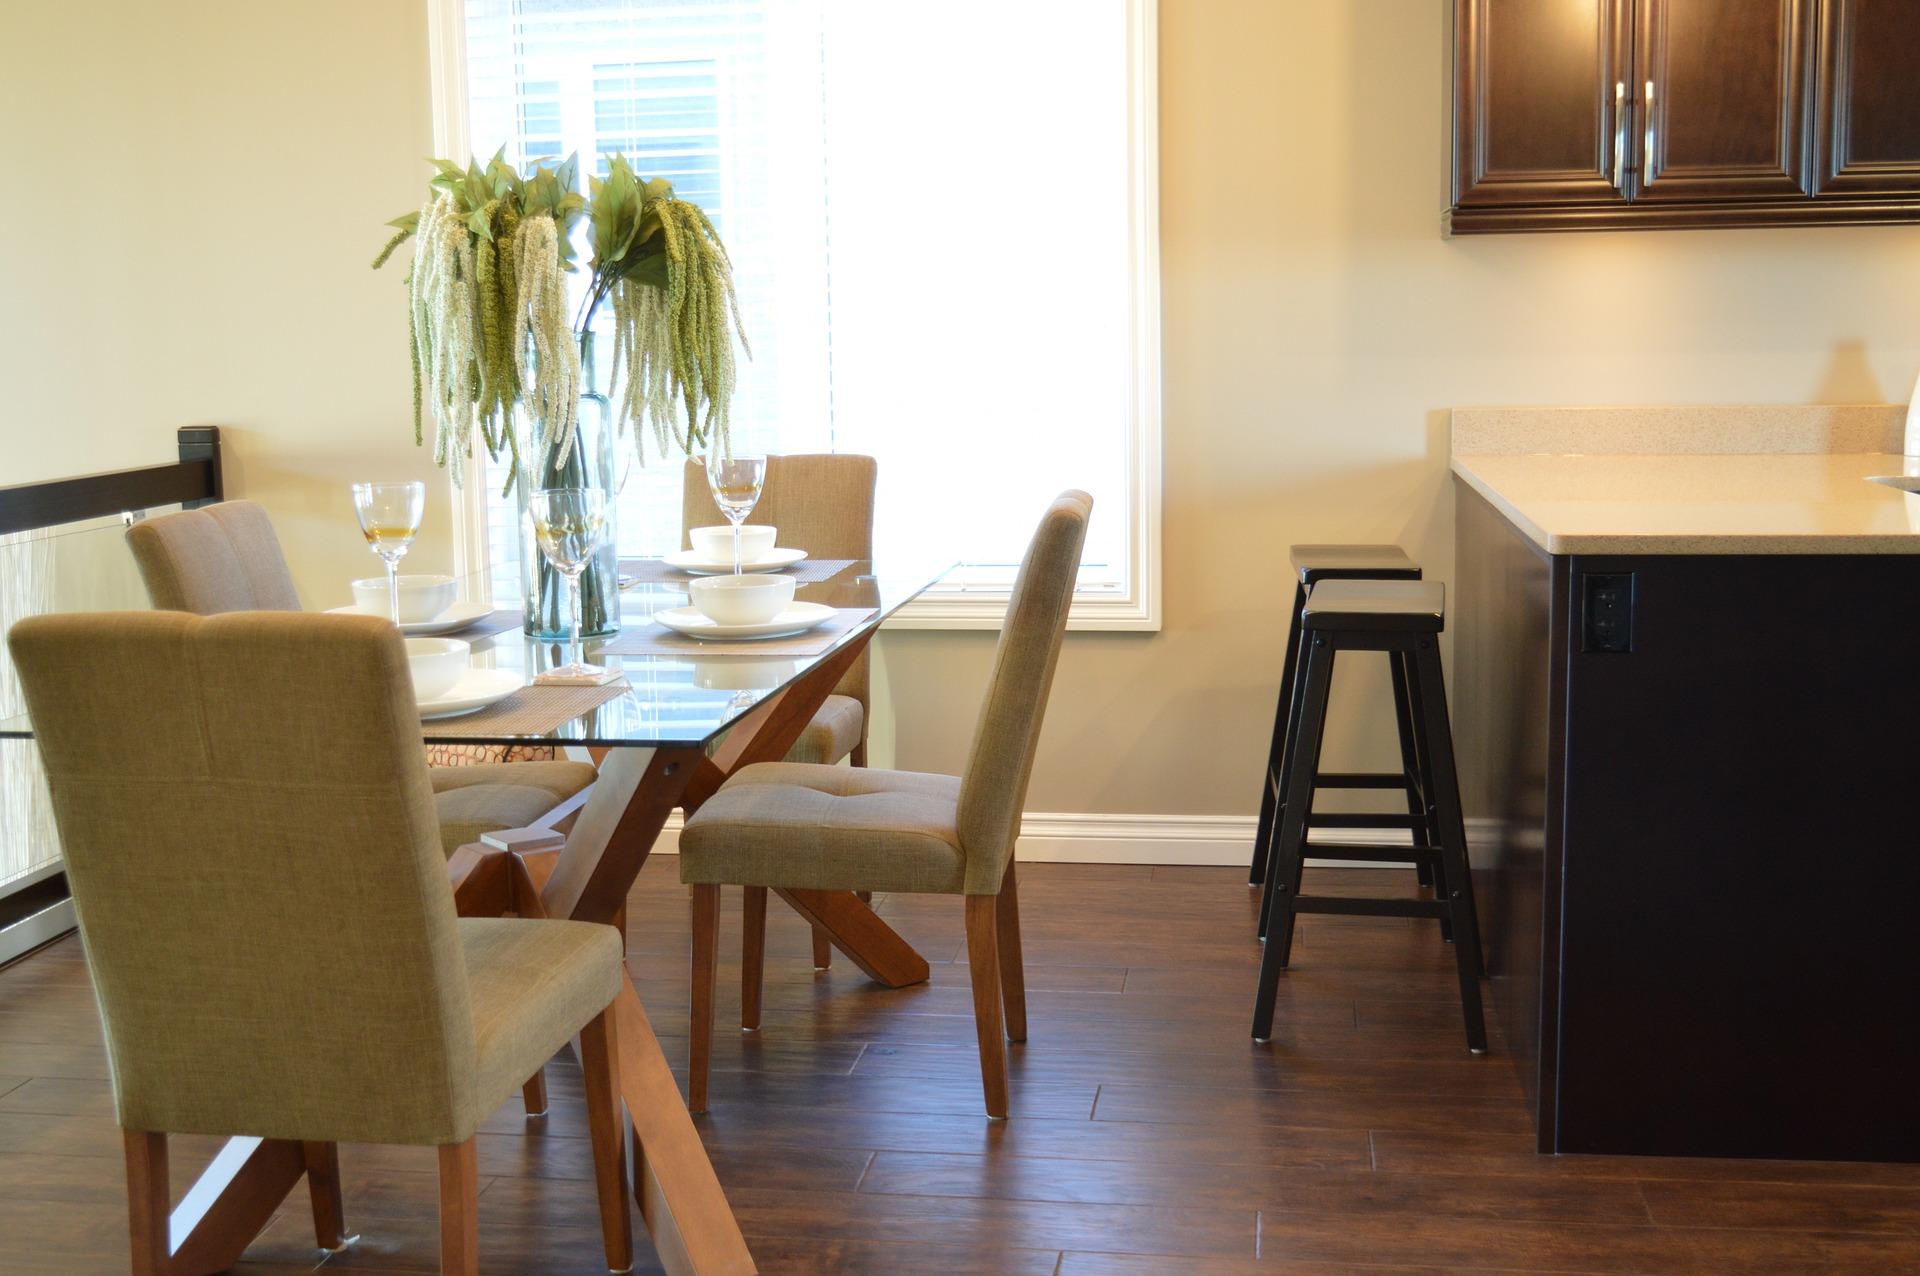 Is Vinyl Flooring A Good Choice For Family Homes